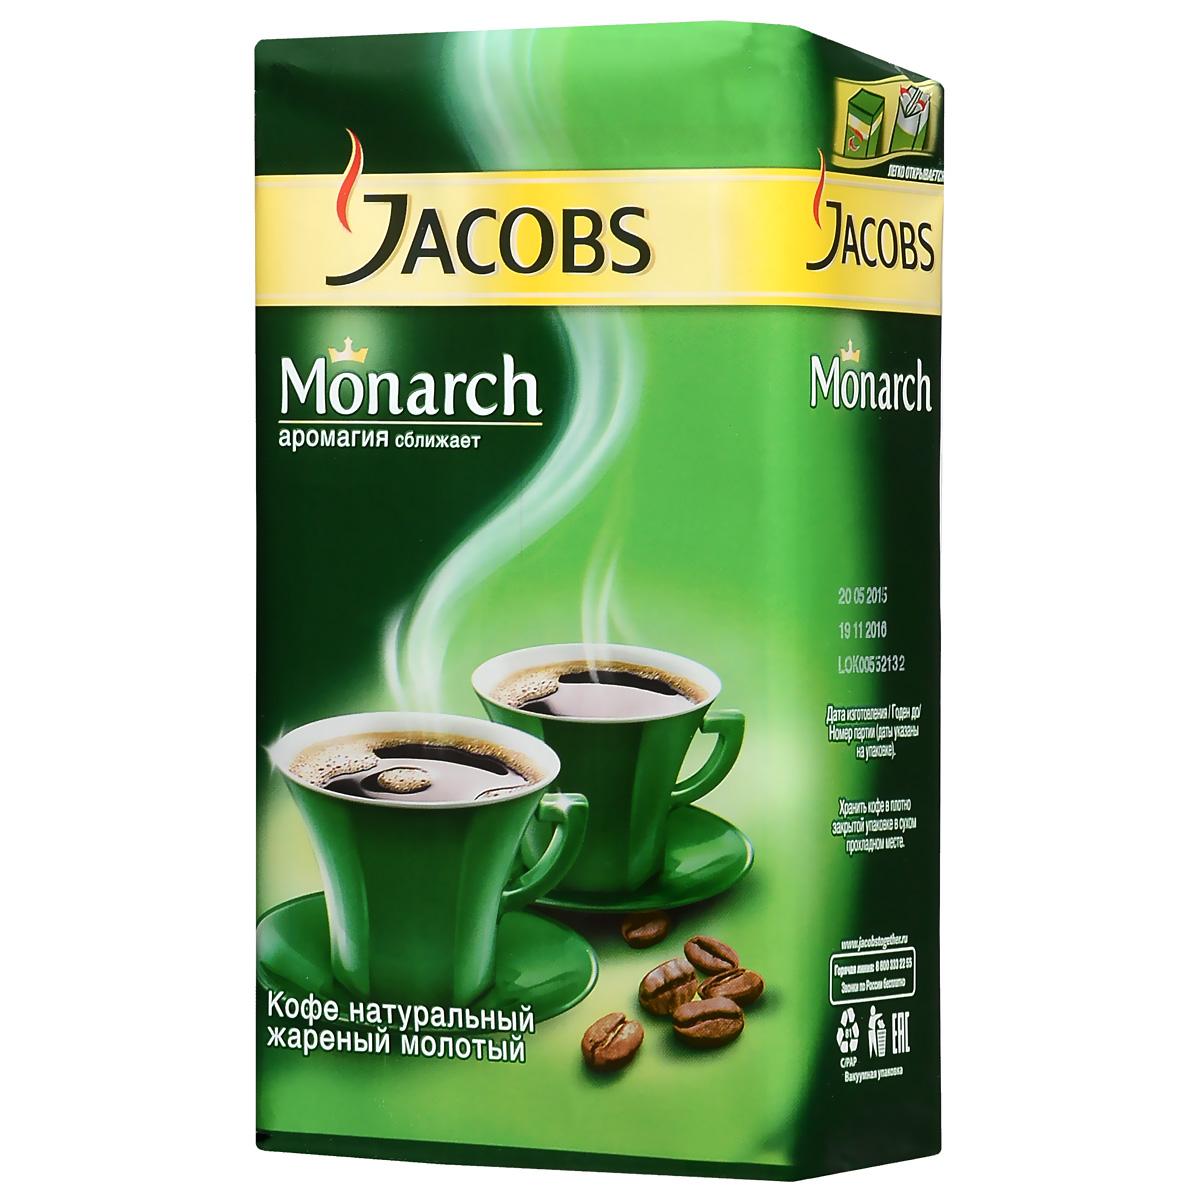 Jacobs Monarch кофе молотый, 250 г